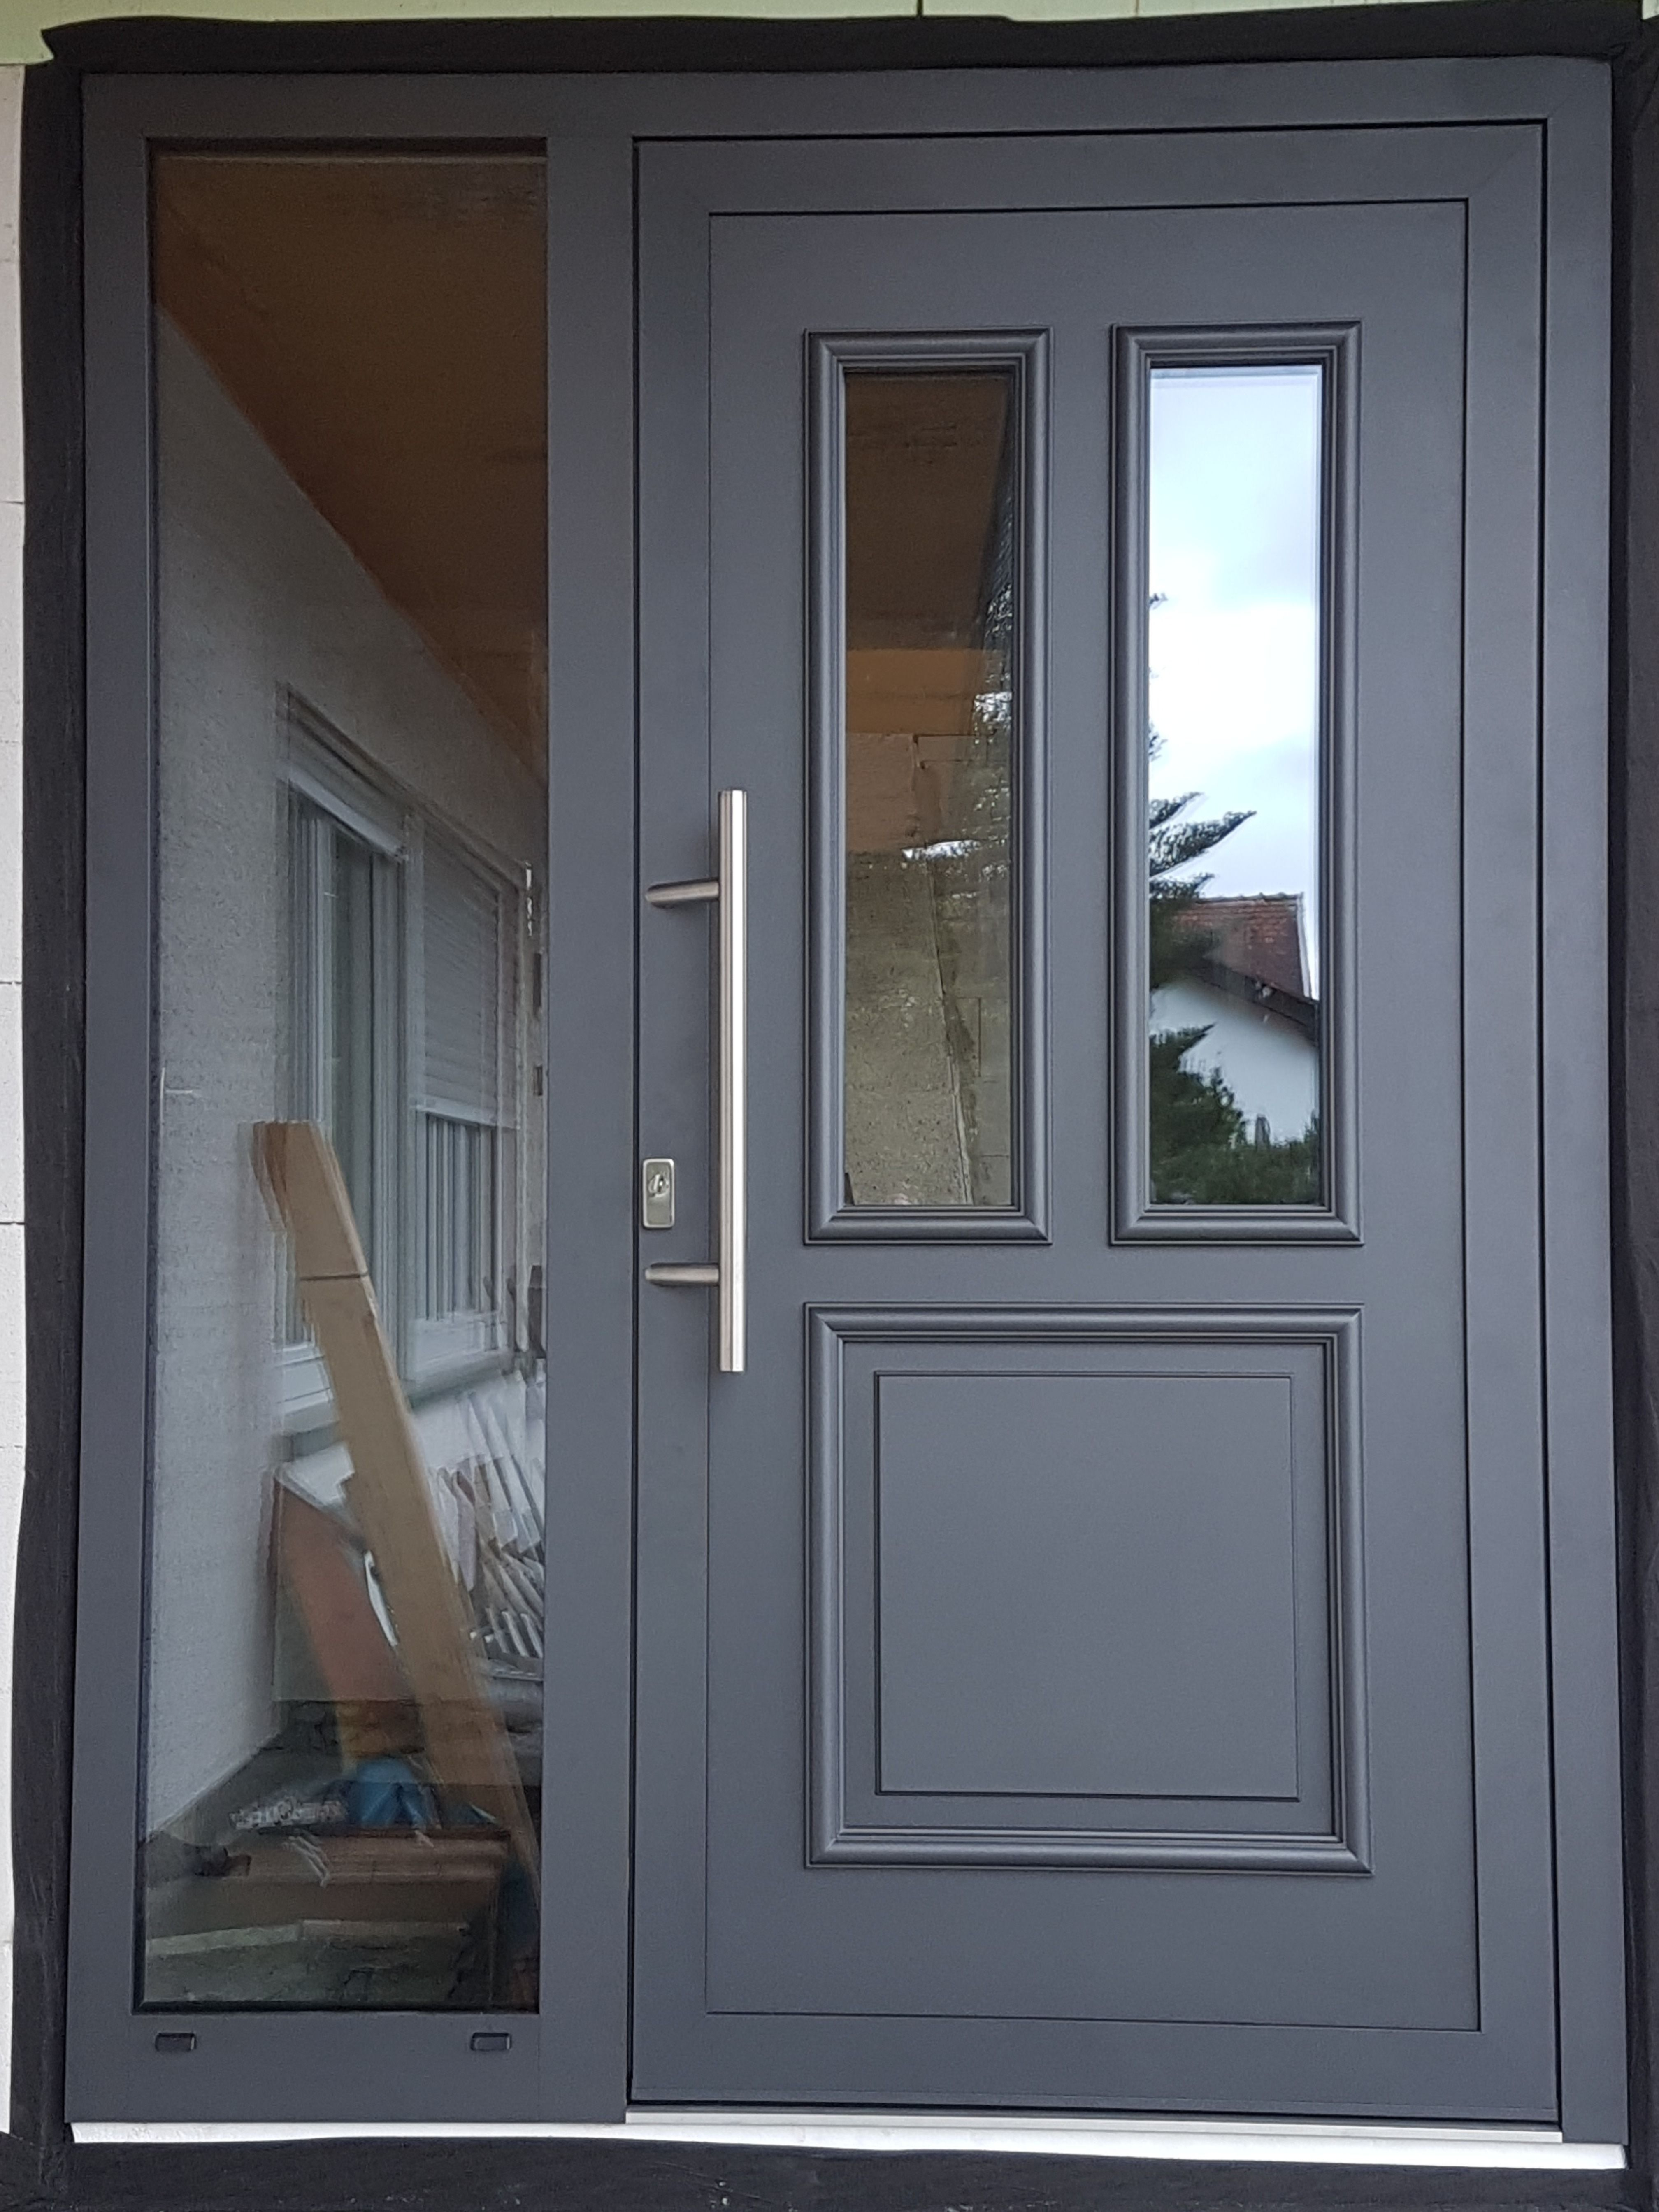 Klassische Haustür in Anthrazit Eisenglimmer aus Aluminium #frontdoor Klassisch…